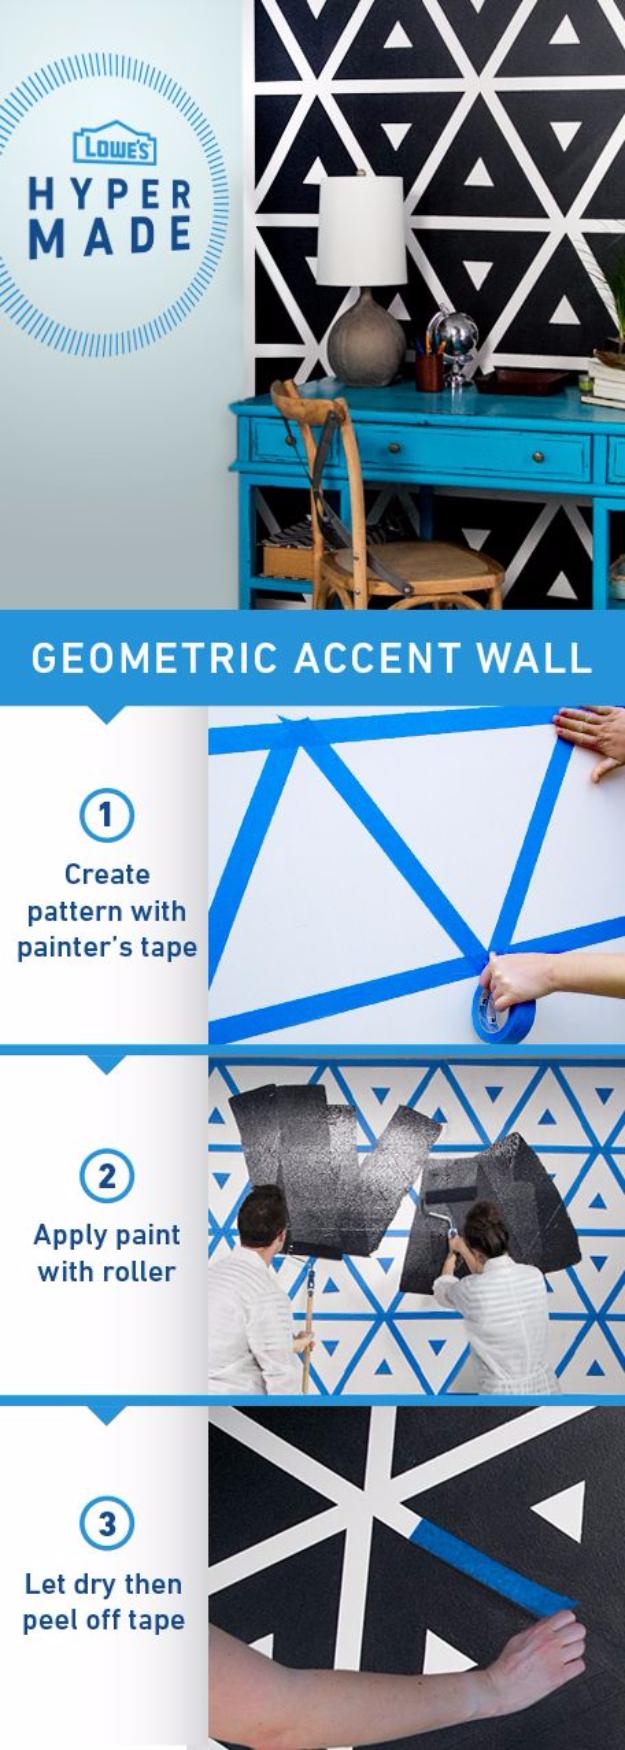 5. DIY Geometric Wall via Simphome